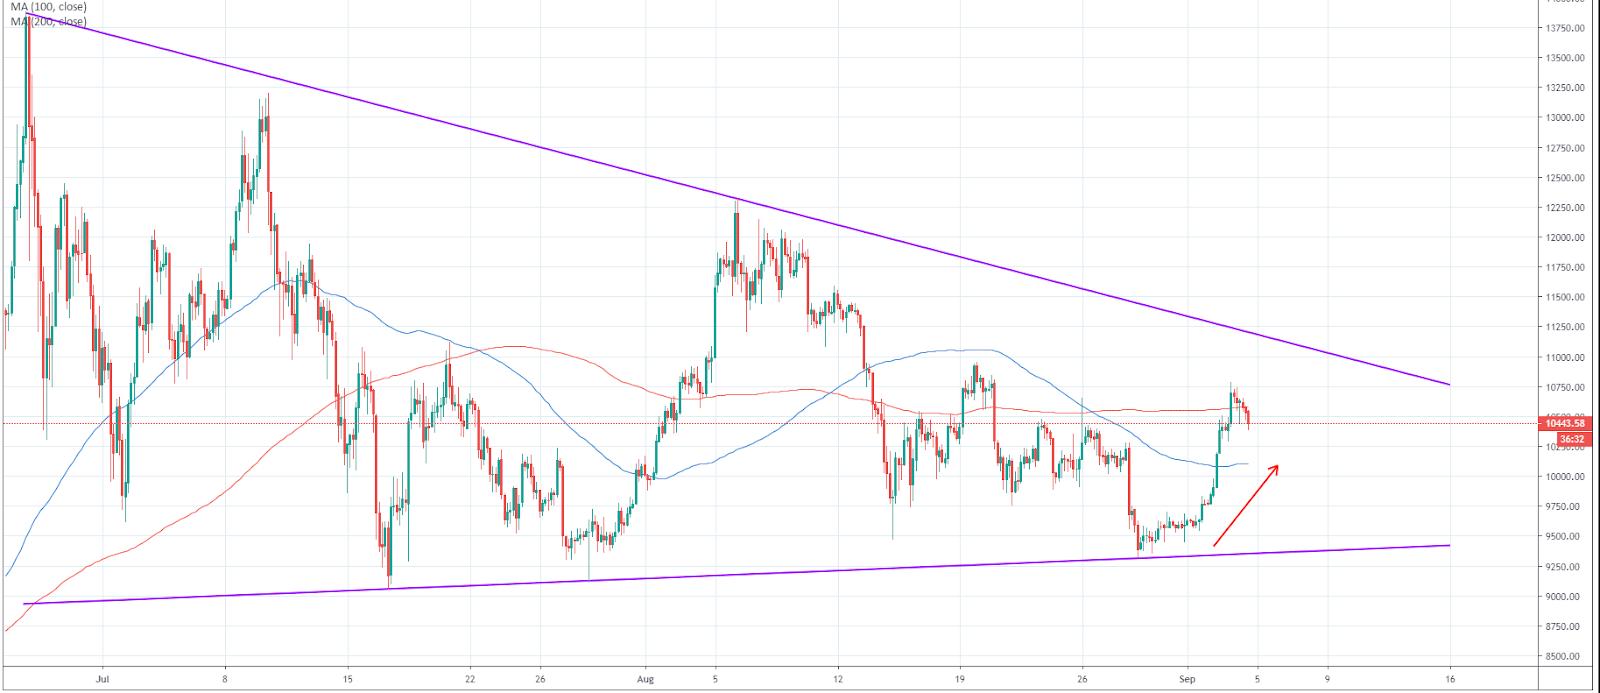 BTC/USD signal generator